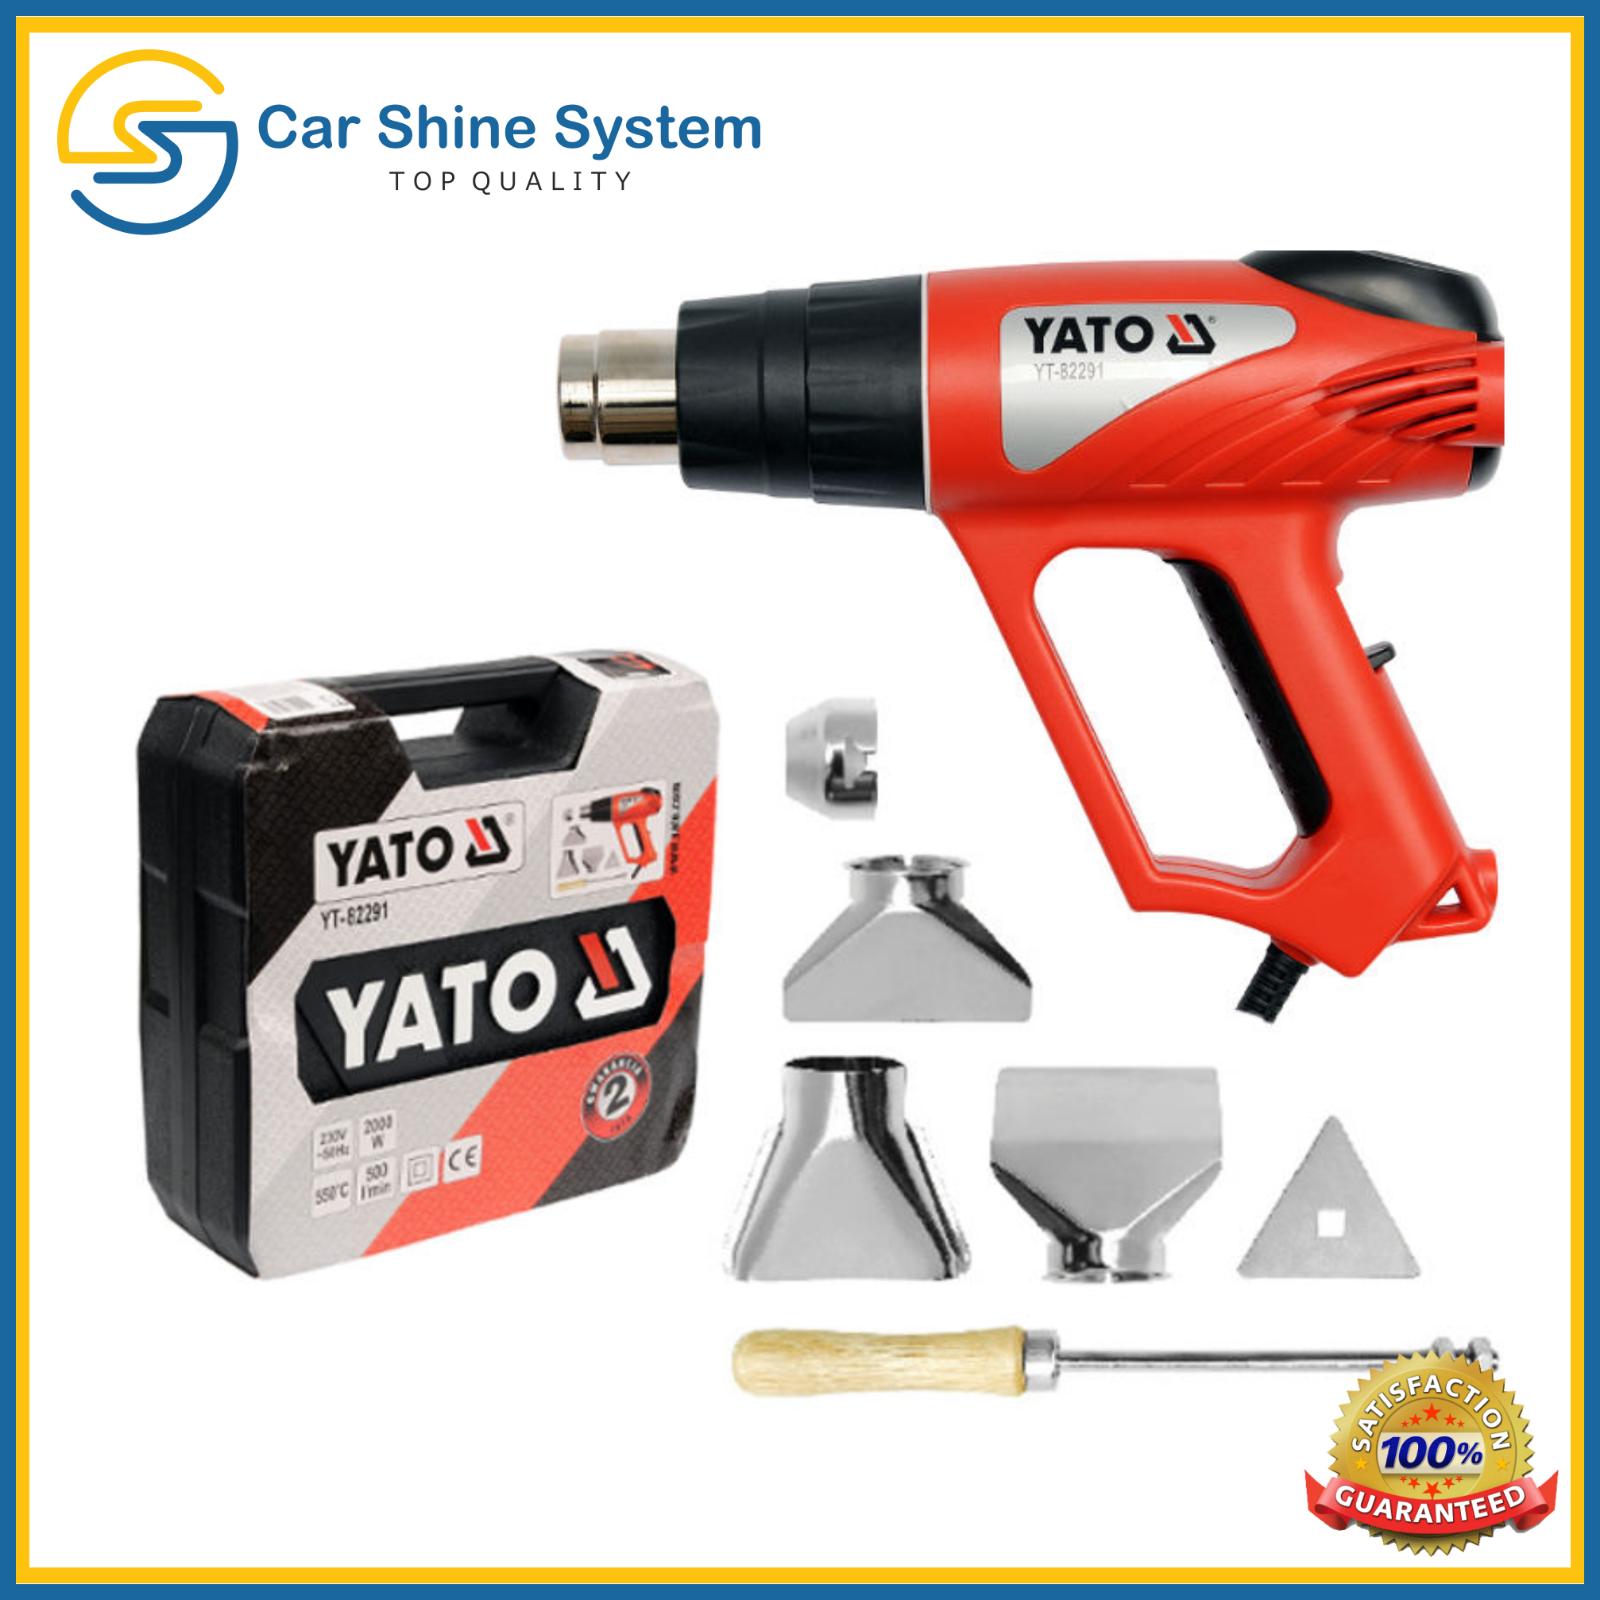 Yato Hot Air Gun with Accessories 2000w LCD Display Temperature Adjustment SET